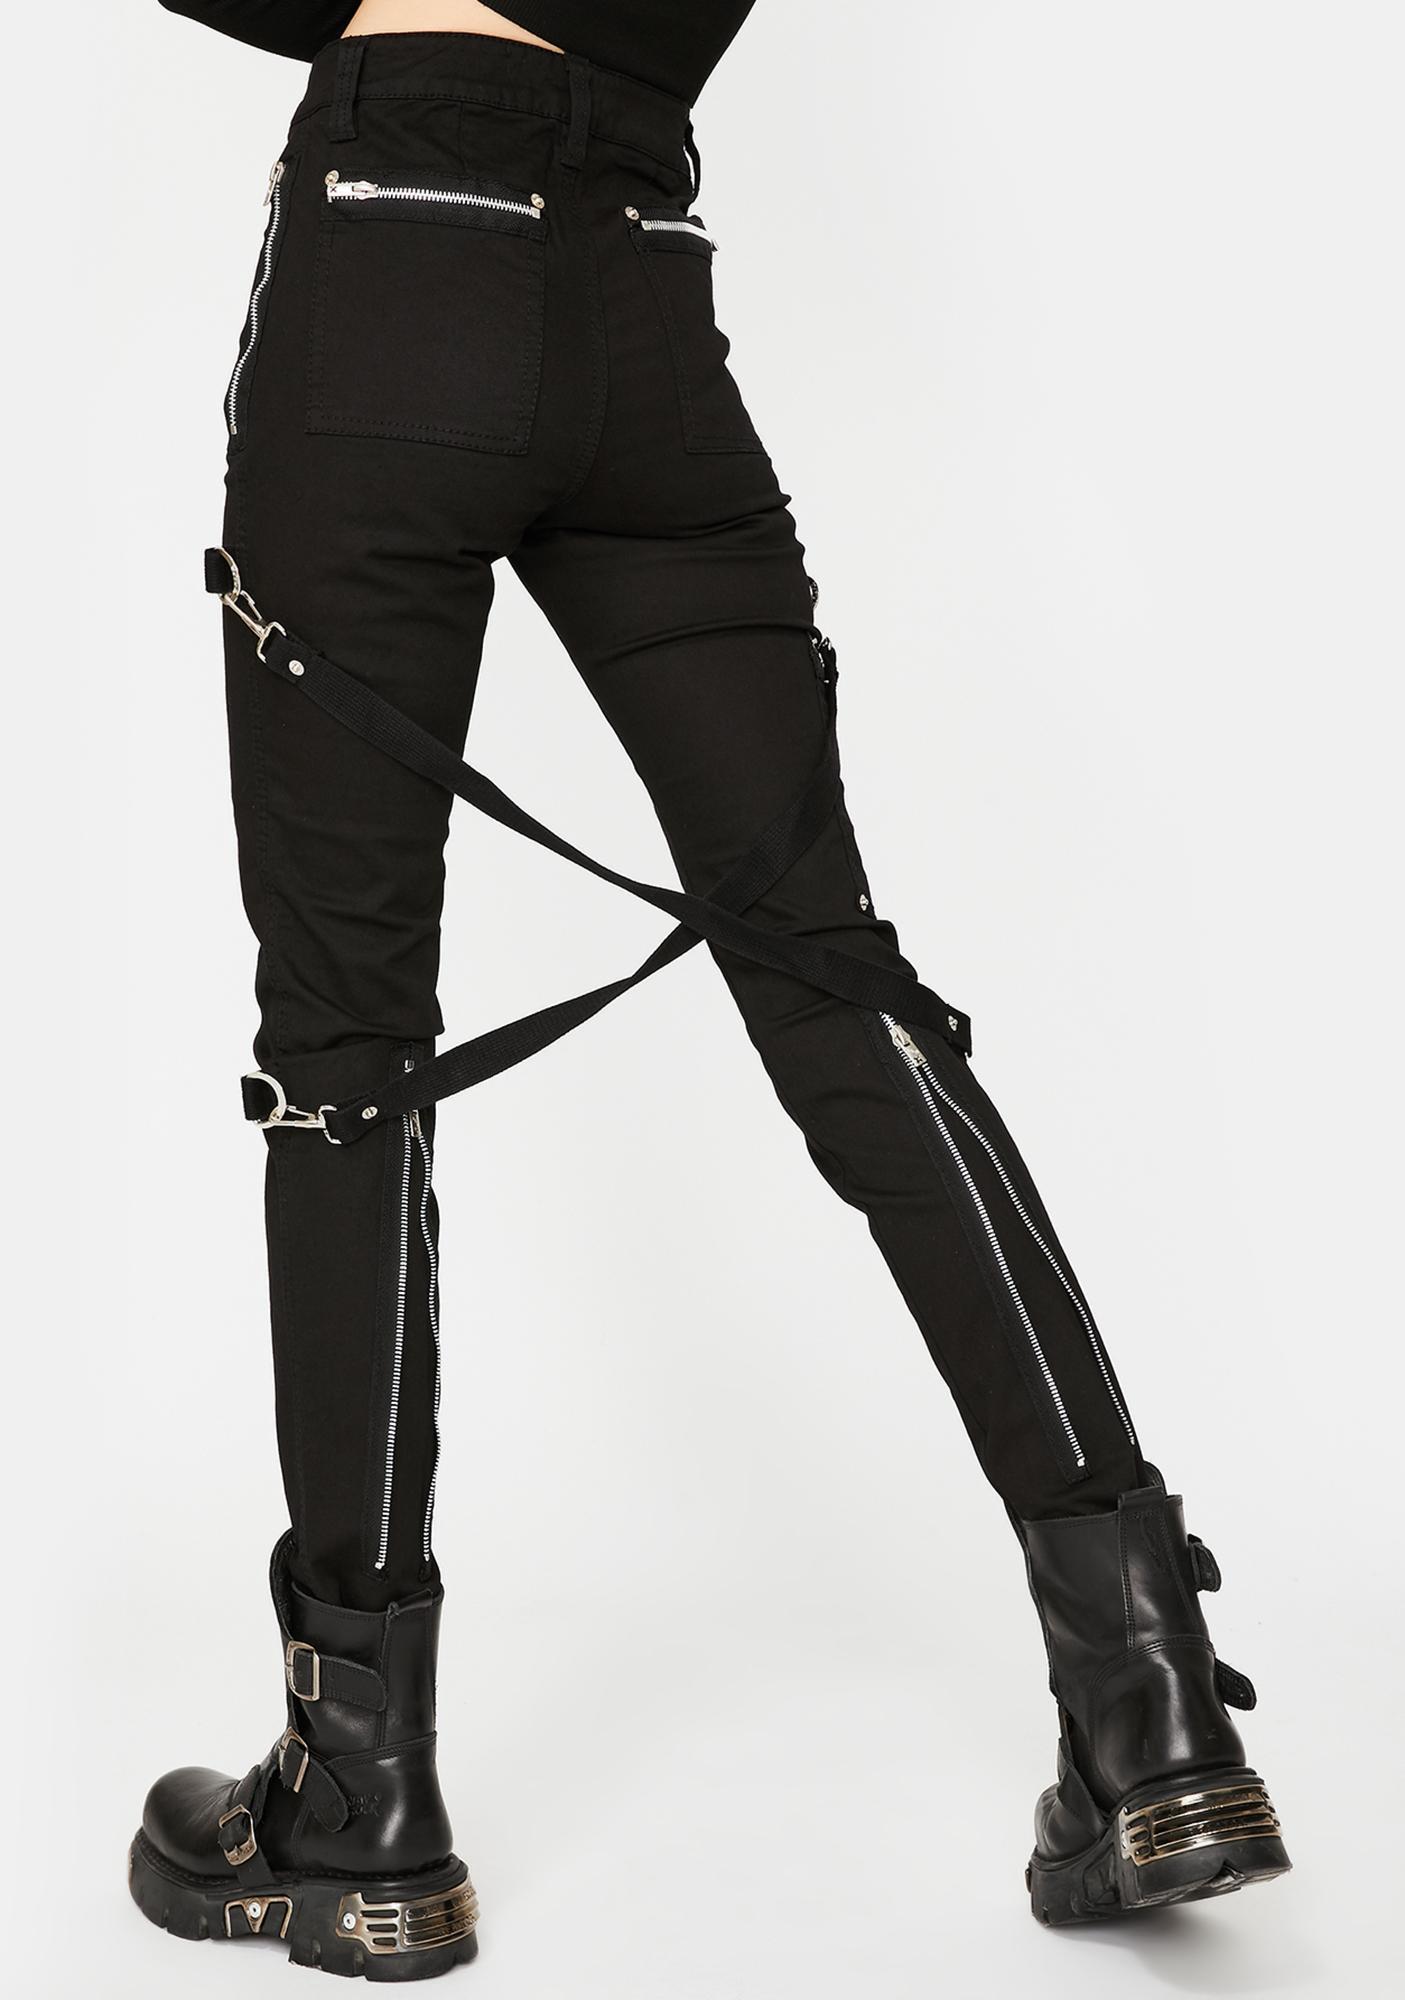 Tripp NYC Black Chaos Bondage Pants